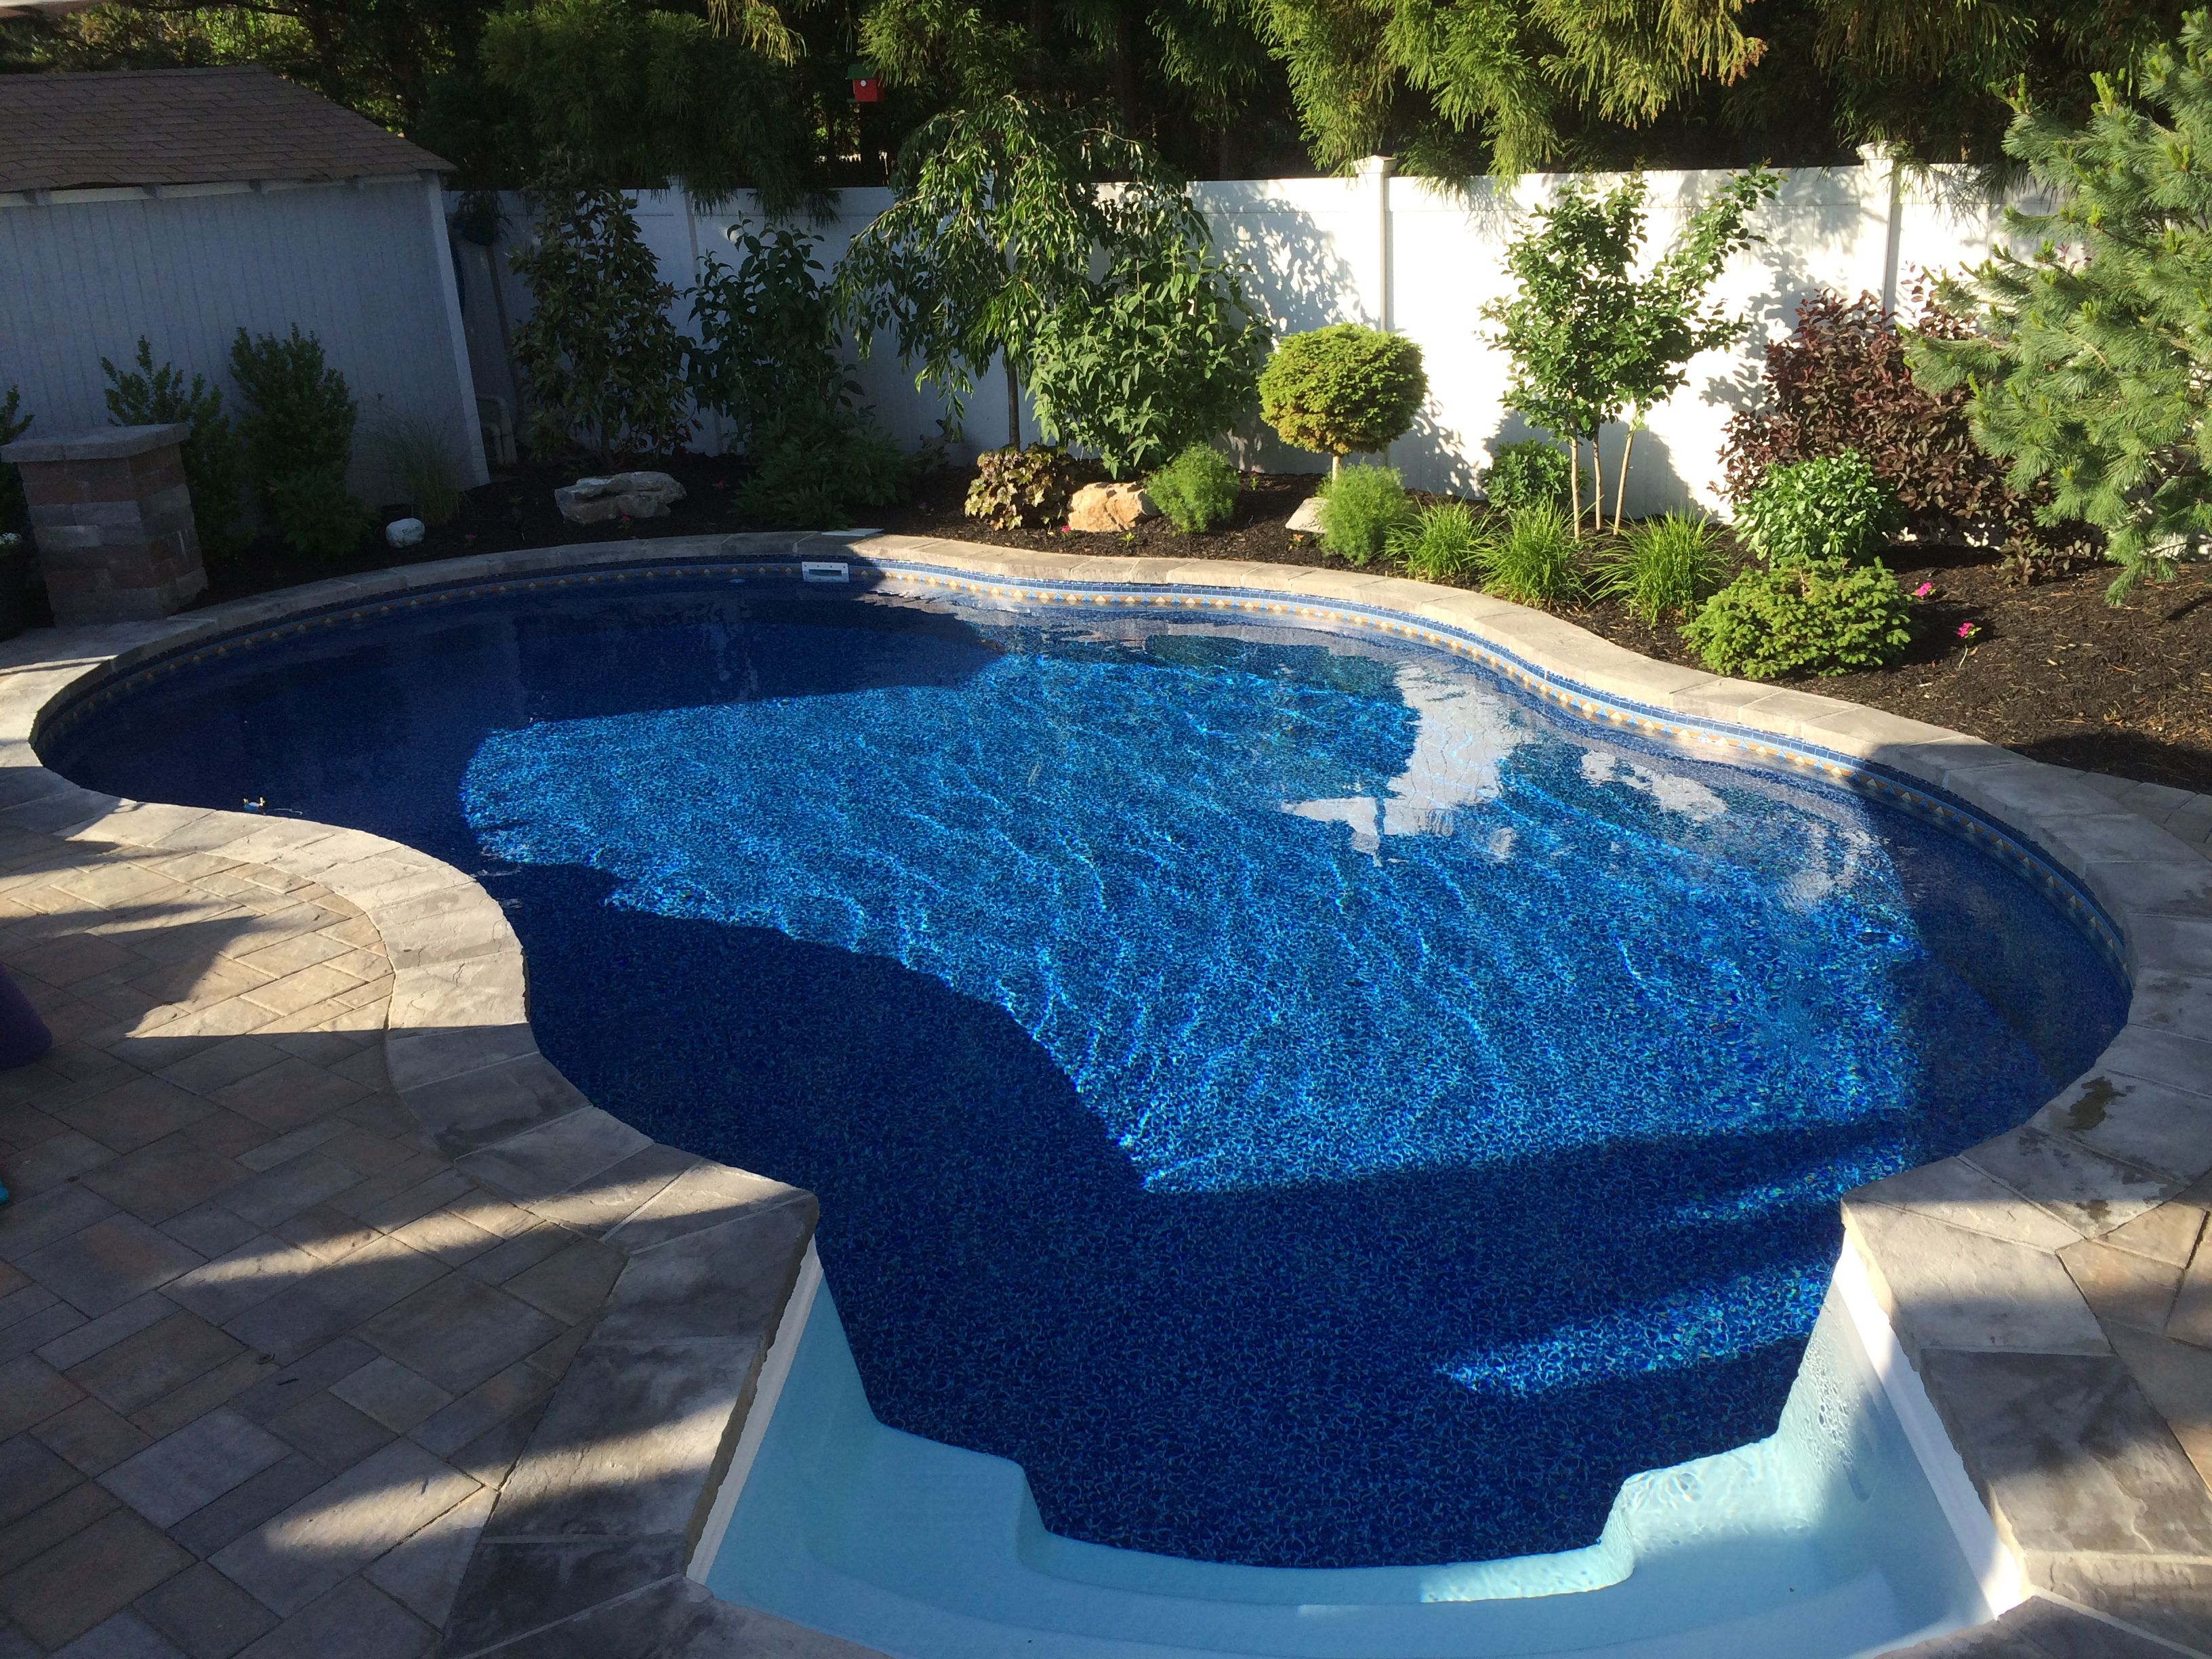 16x28 Radiant Freeform In Ground Pool Radiant Pools 2014